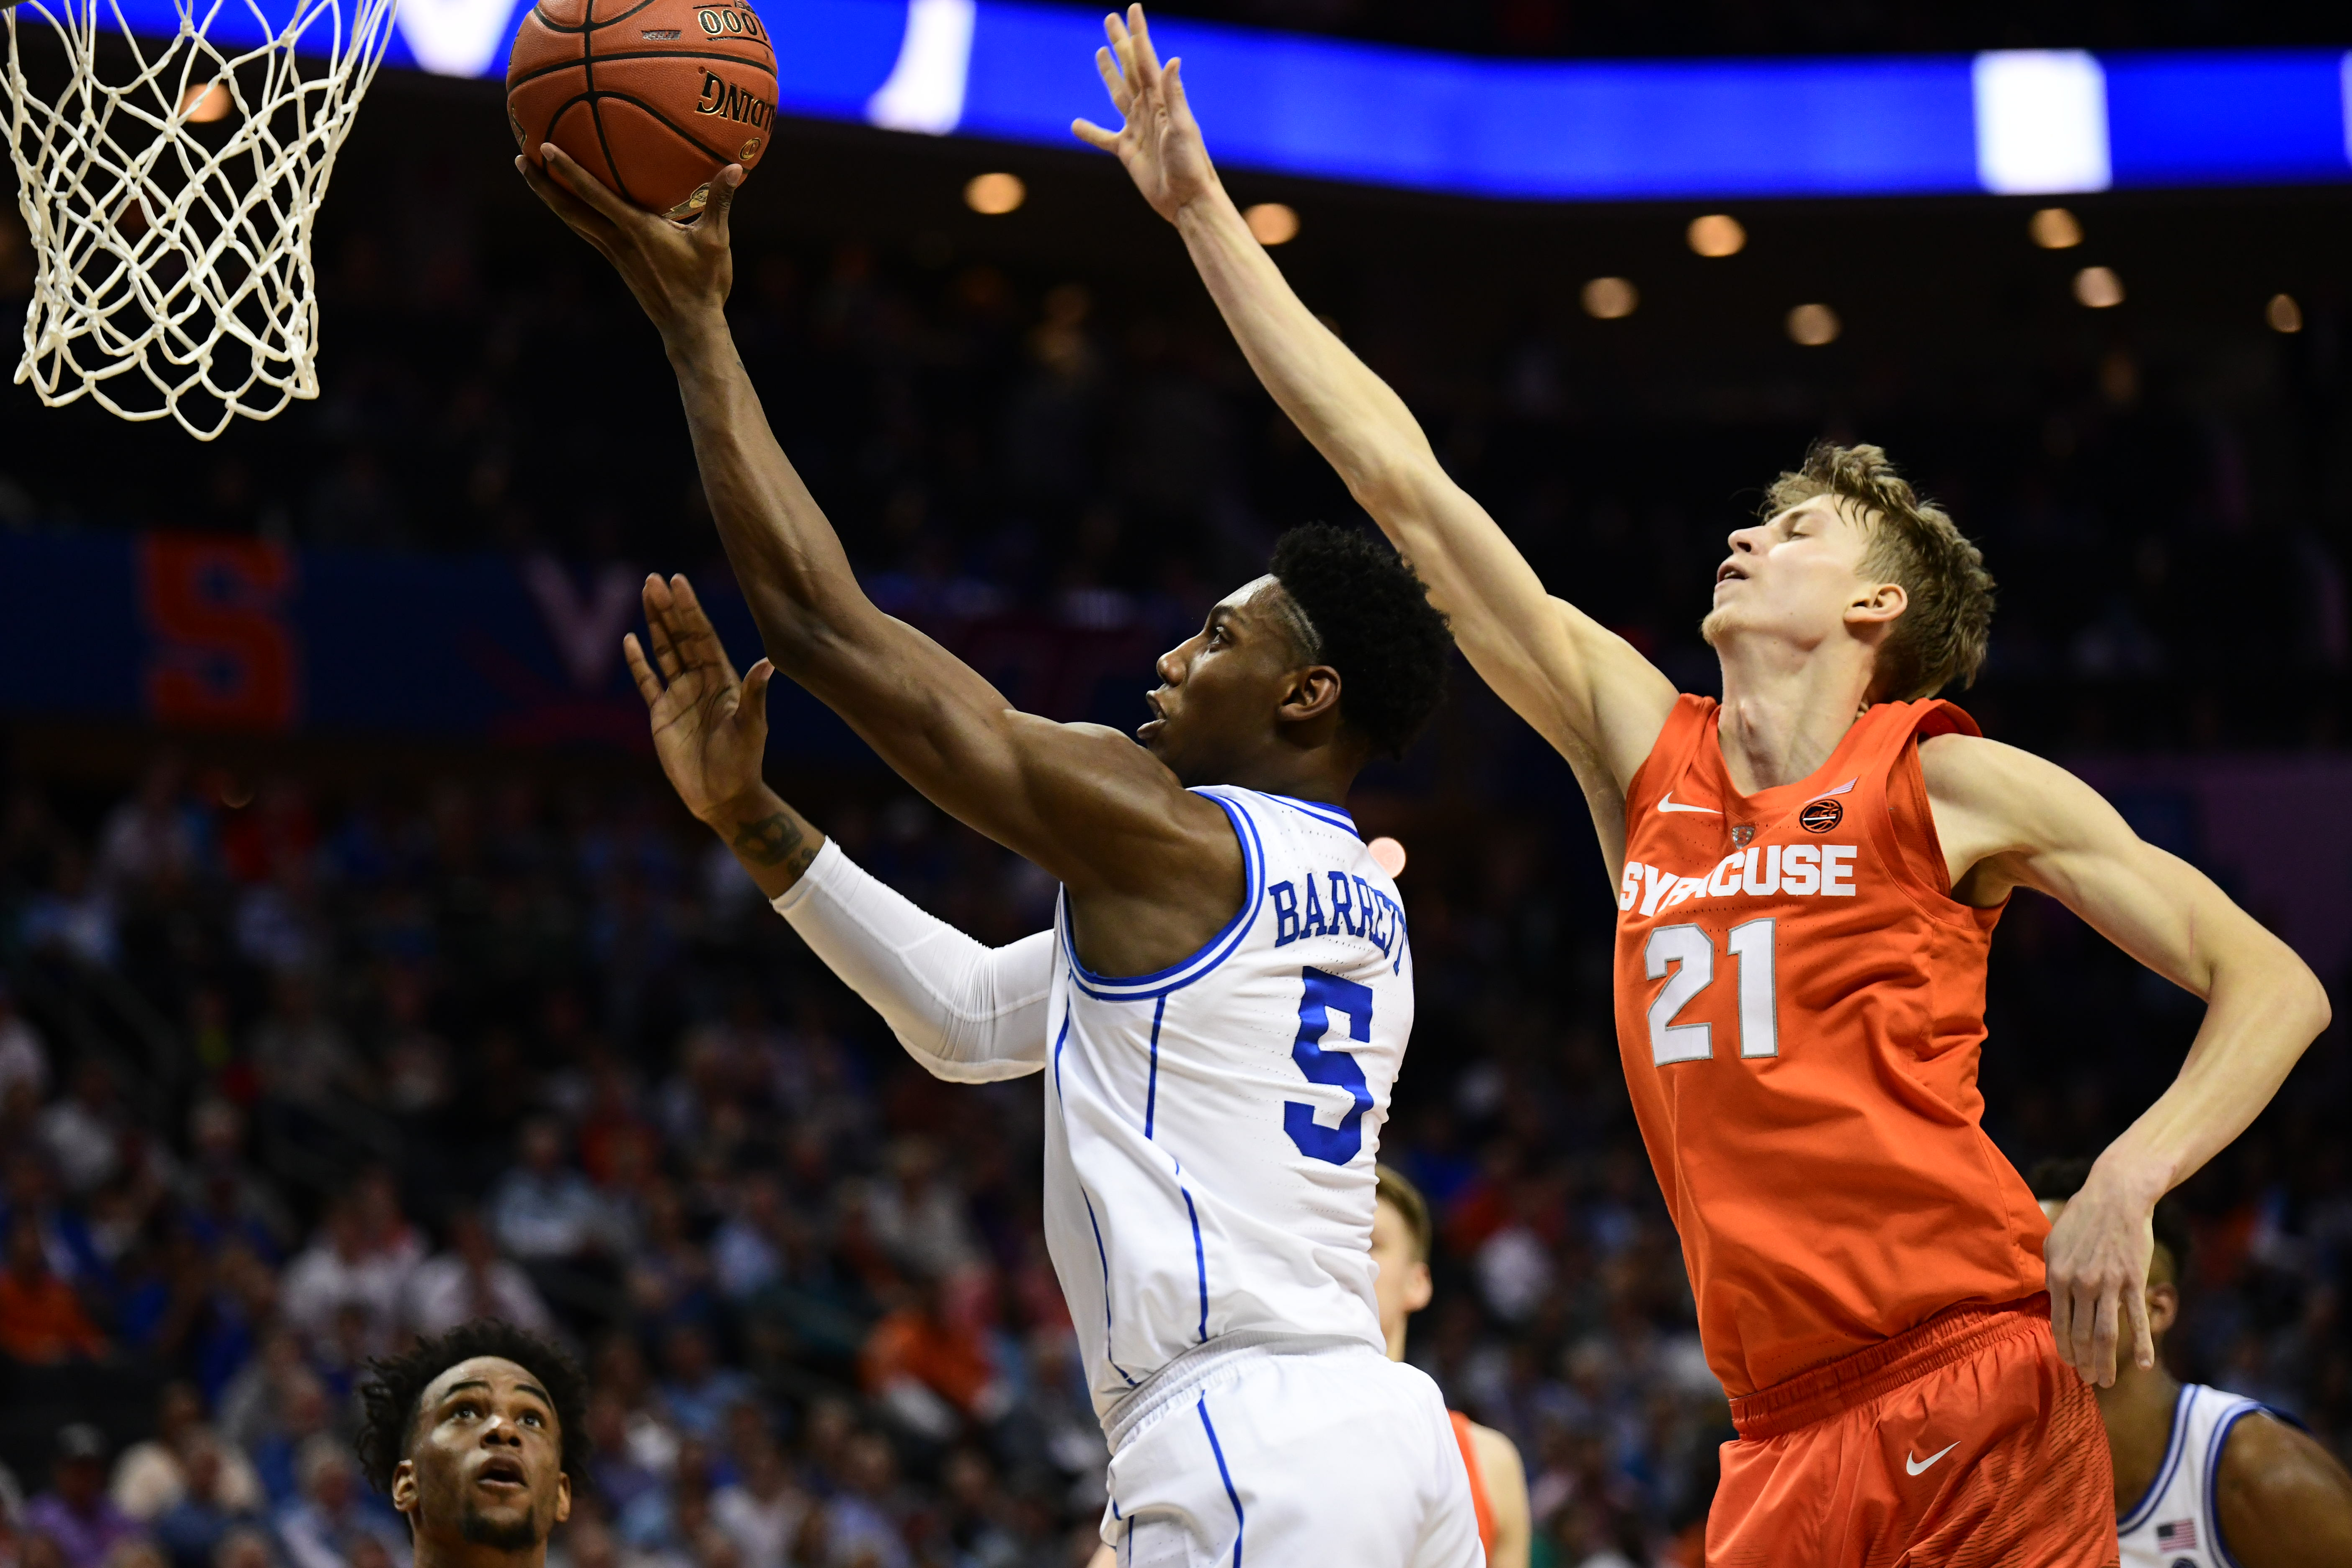 COLLEGE BASKETBALL: MAR 14 ACC Tournament Syracuse v Duke